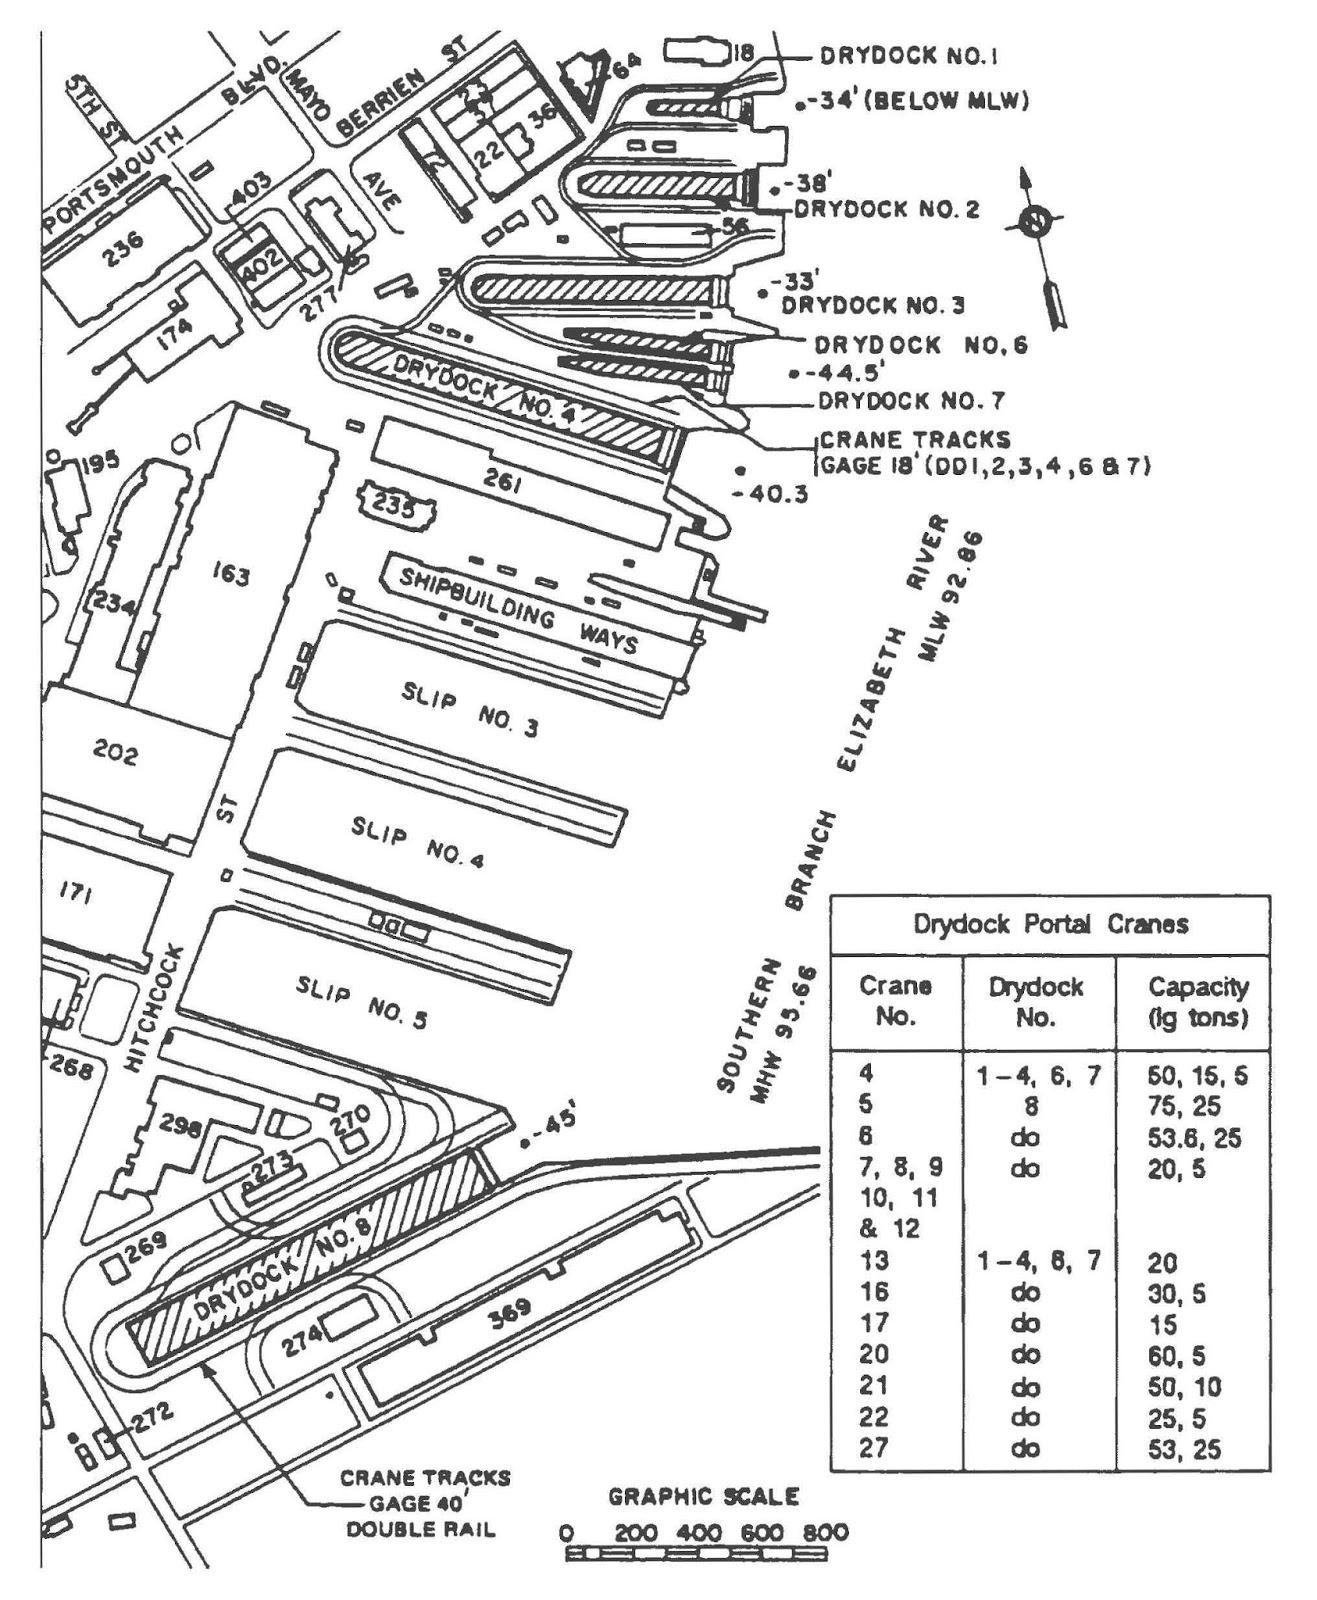 hight resolution of hampton roads naval museum historic gems norfolk naval shipyard s semi truck loading dock dimensions dry dock diagram